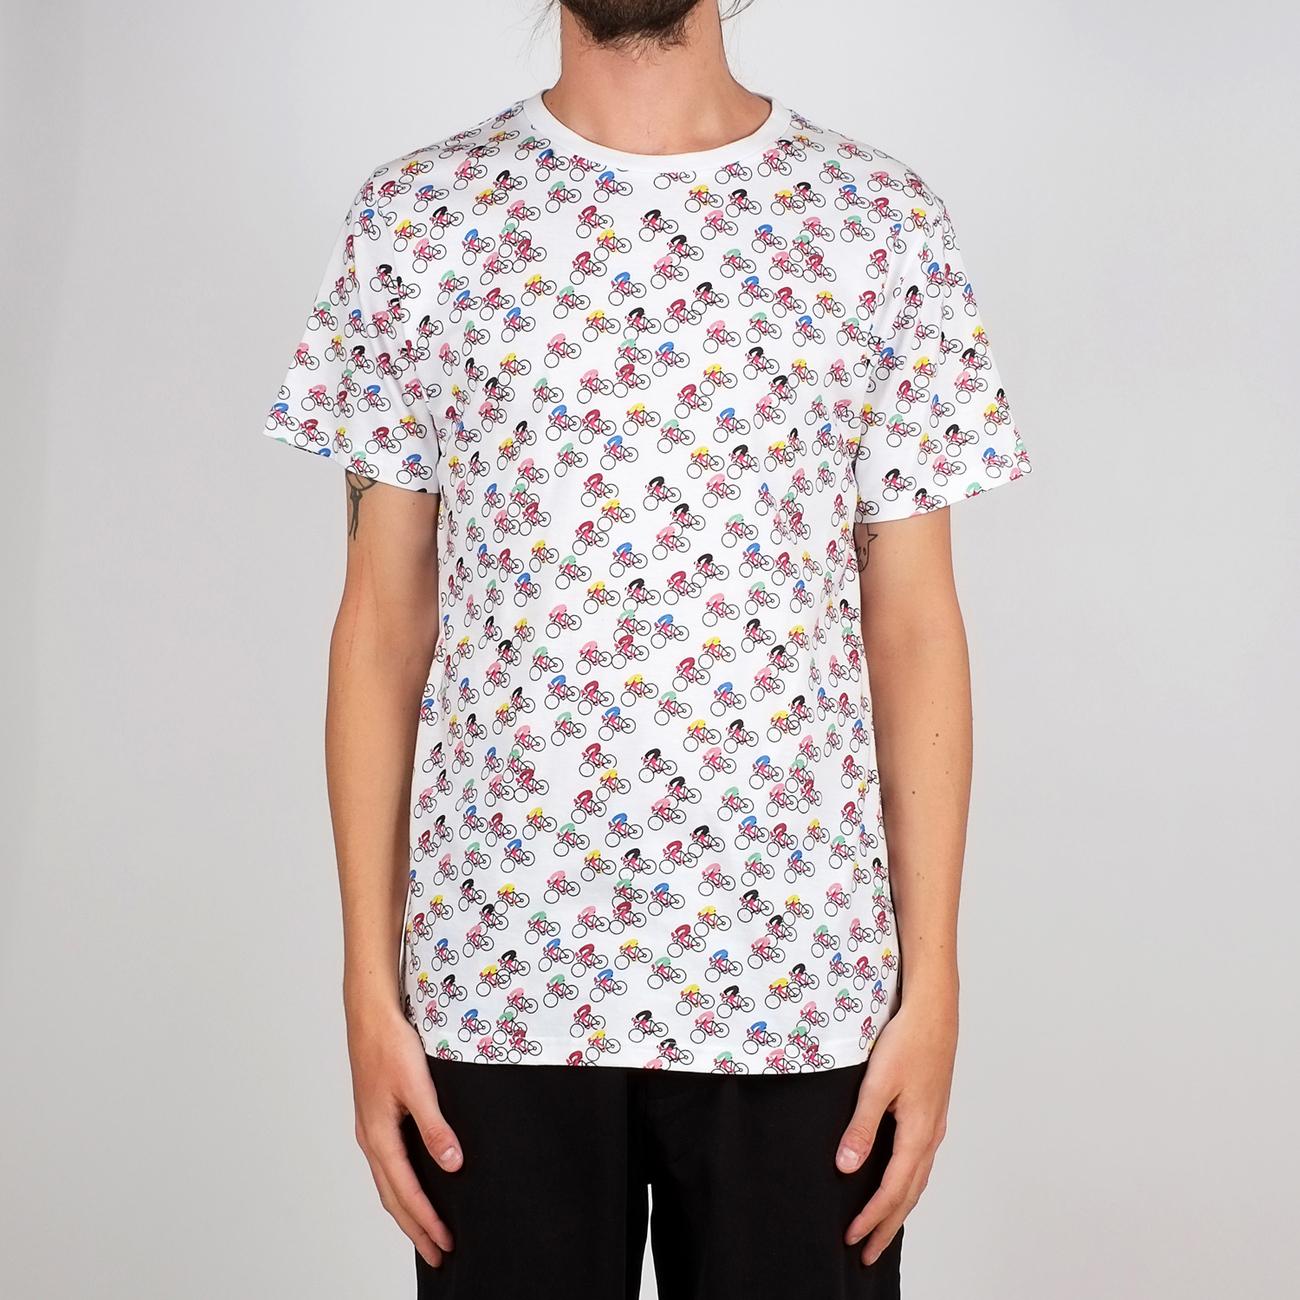 Dedicated t shirt stockholm bike race for Marathon t shirt printing